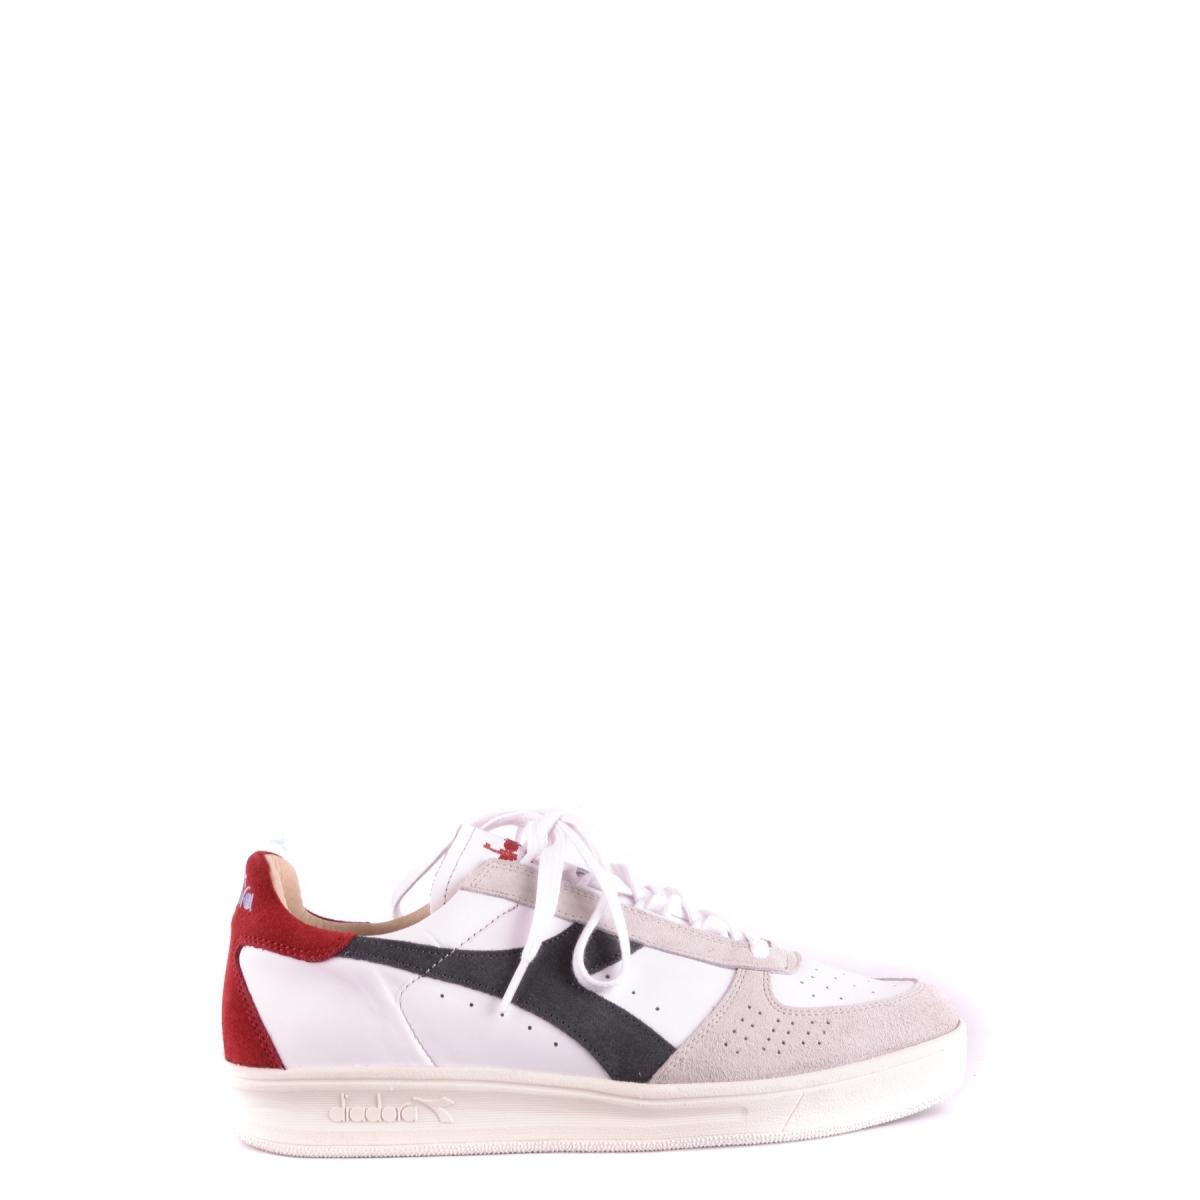 Billig Qualität gute Qualität Billig Schuhe Diadora 32918DE -20% 000140